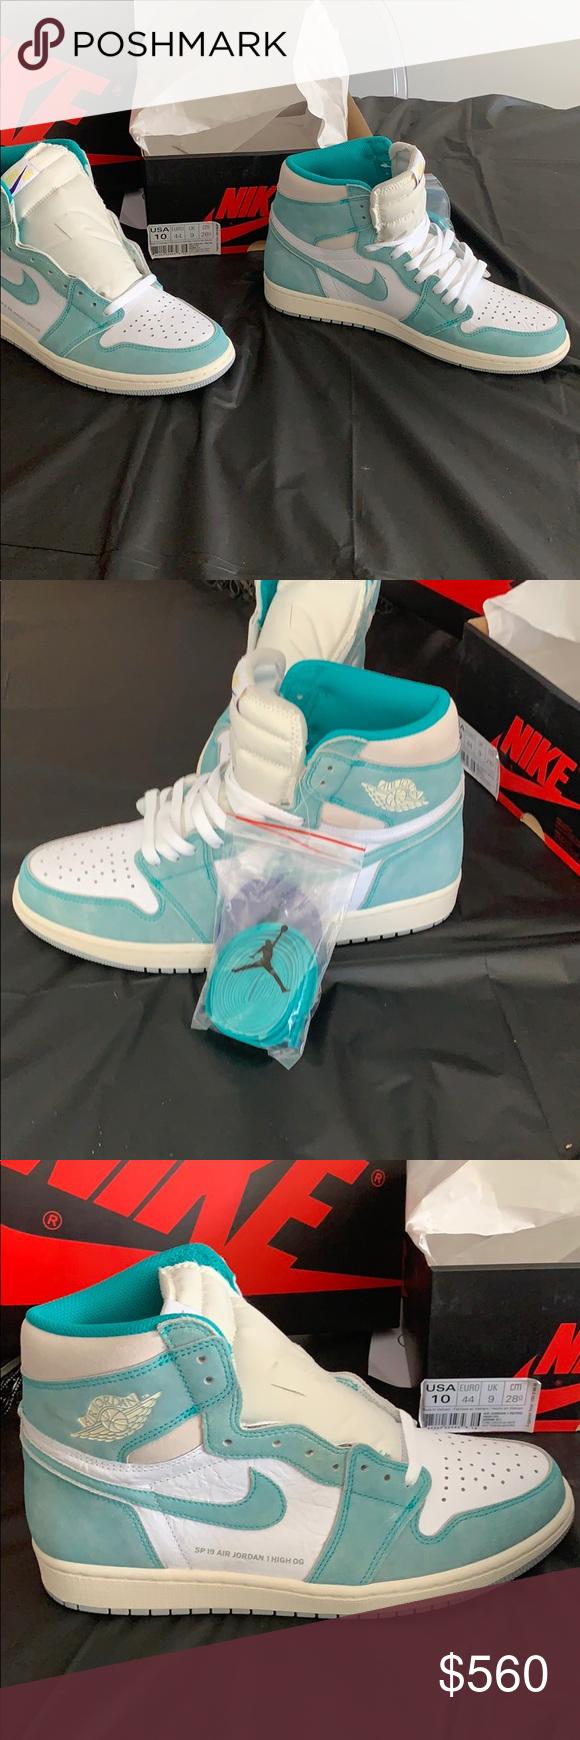 Air Jordan 1 retro high OG Nike Air